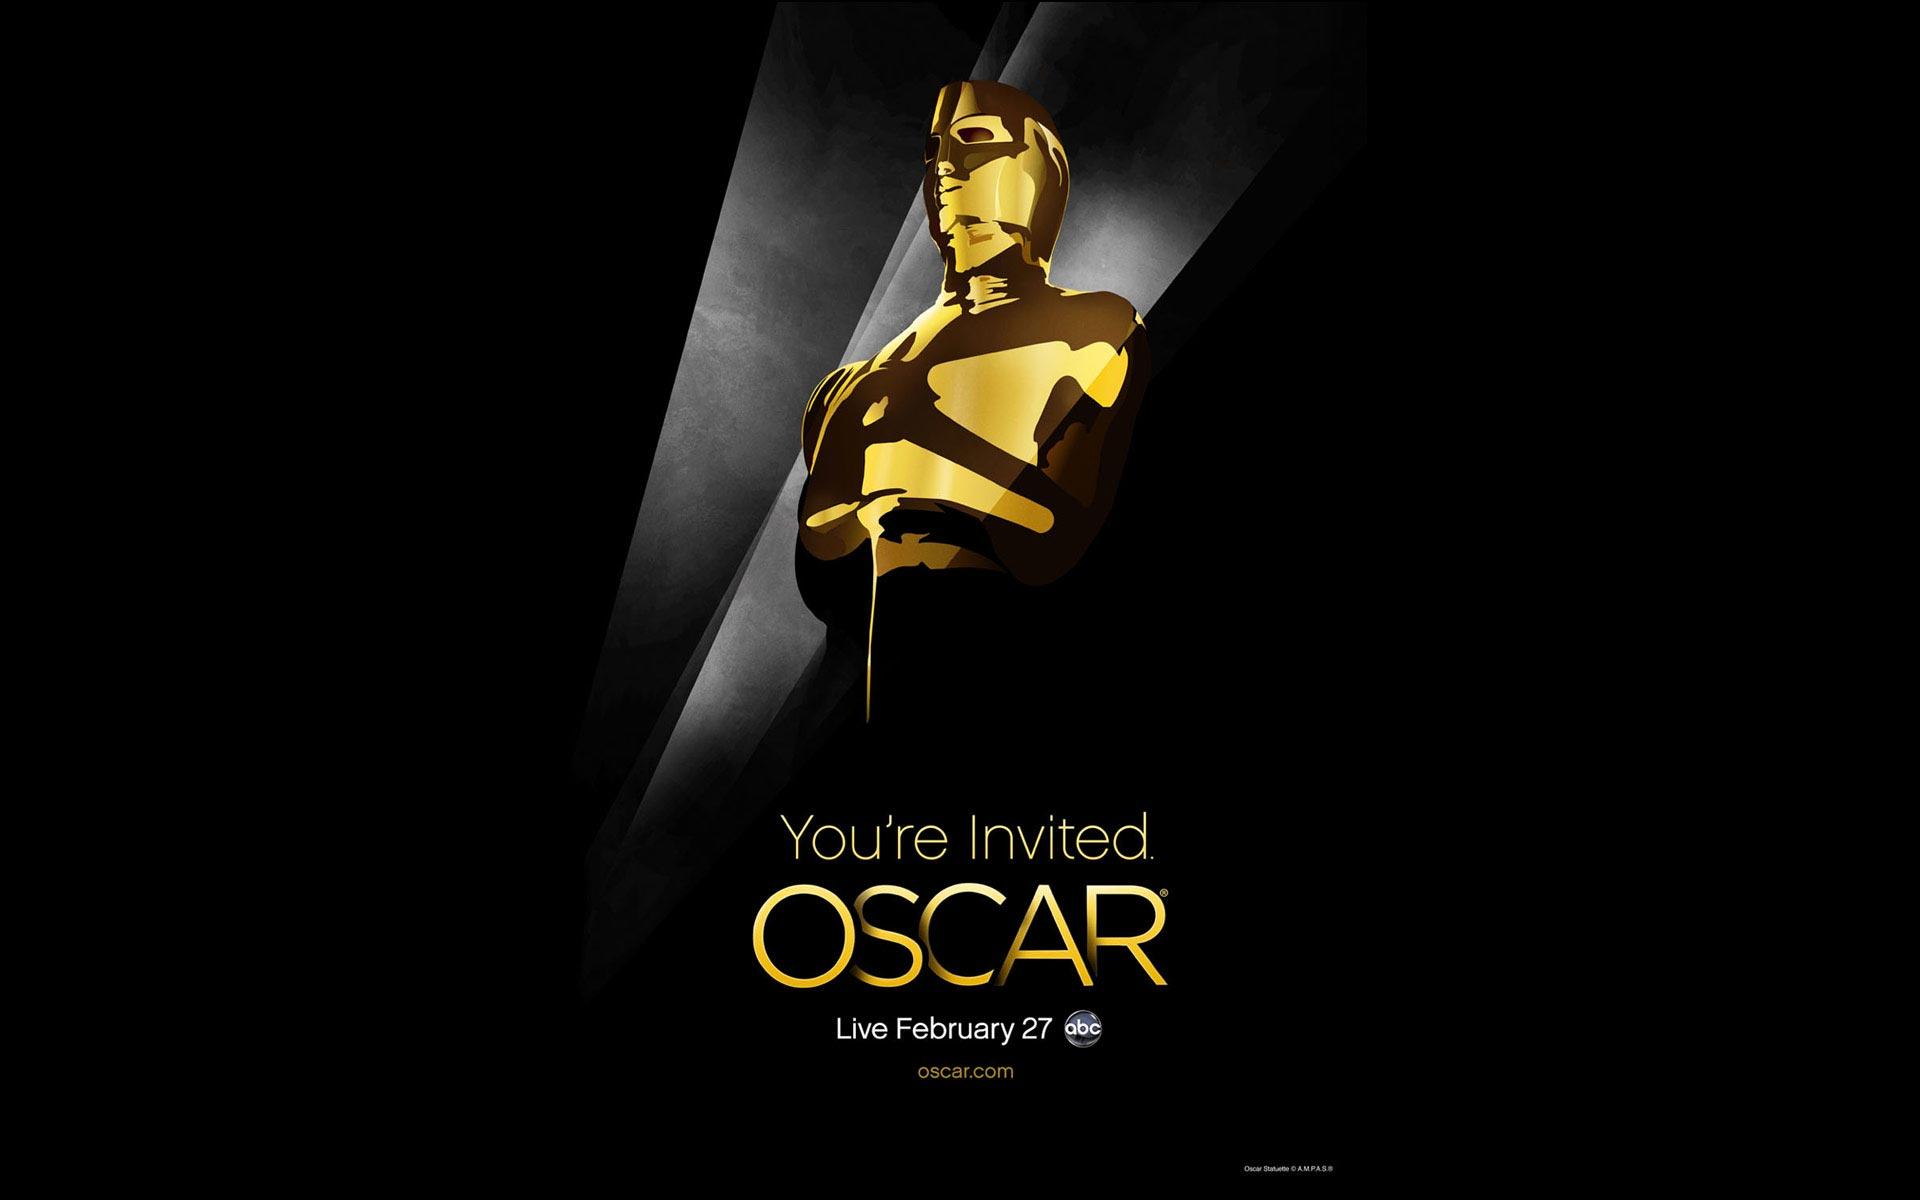 Oscar Envelope 2015 2 also Moonlight La La Land Oscars Mix Up likewise Justin Timberlake Opens 89th Oscars further Bio together with Free Printable Oscar Party Invitations. on oscar awards envelopes